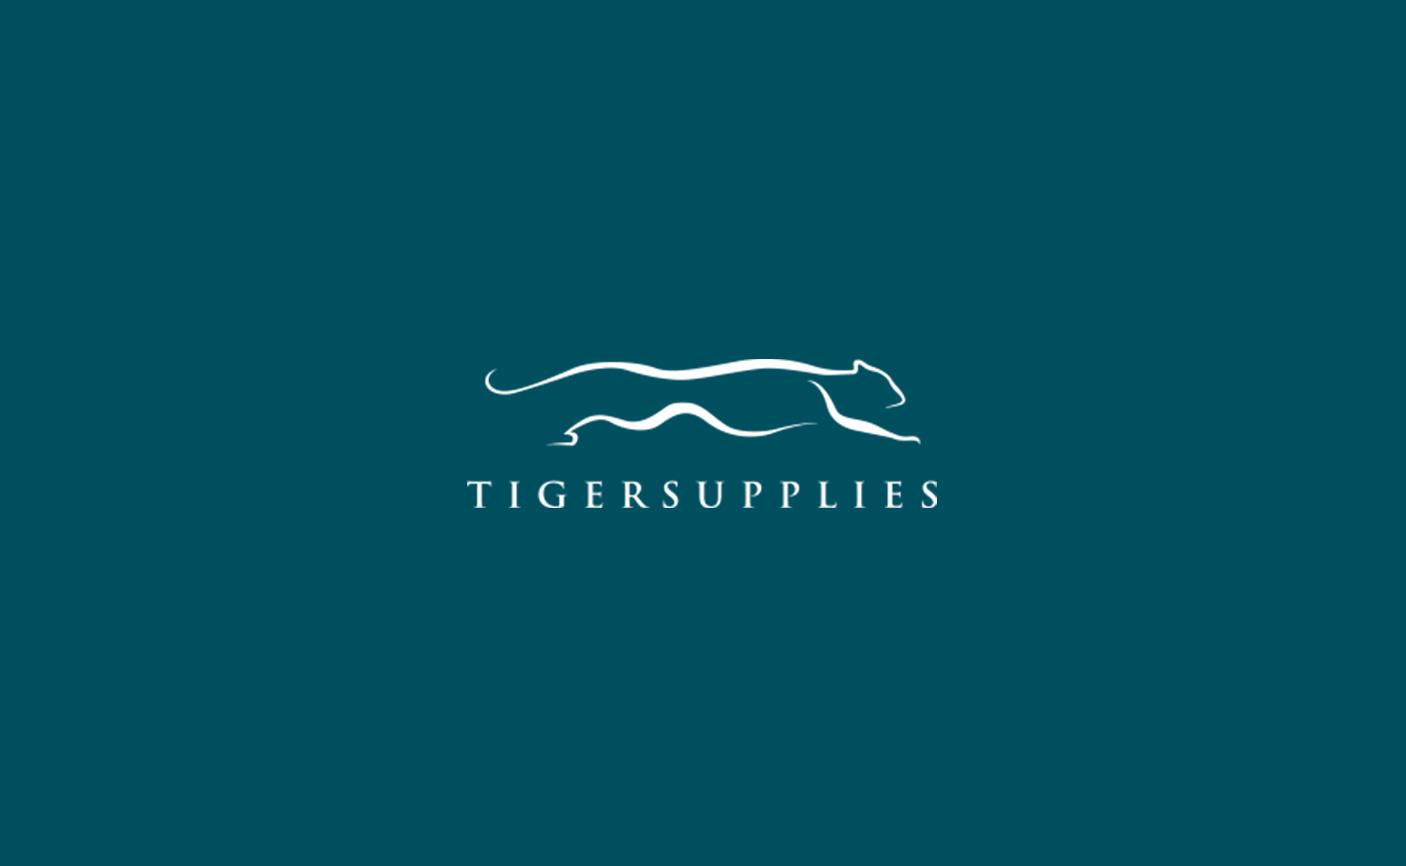 customer-quotes_skagerrak_tiger-supplies